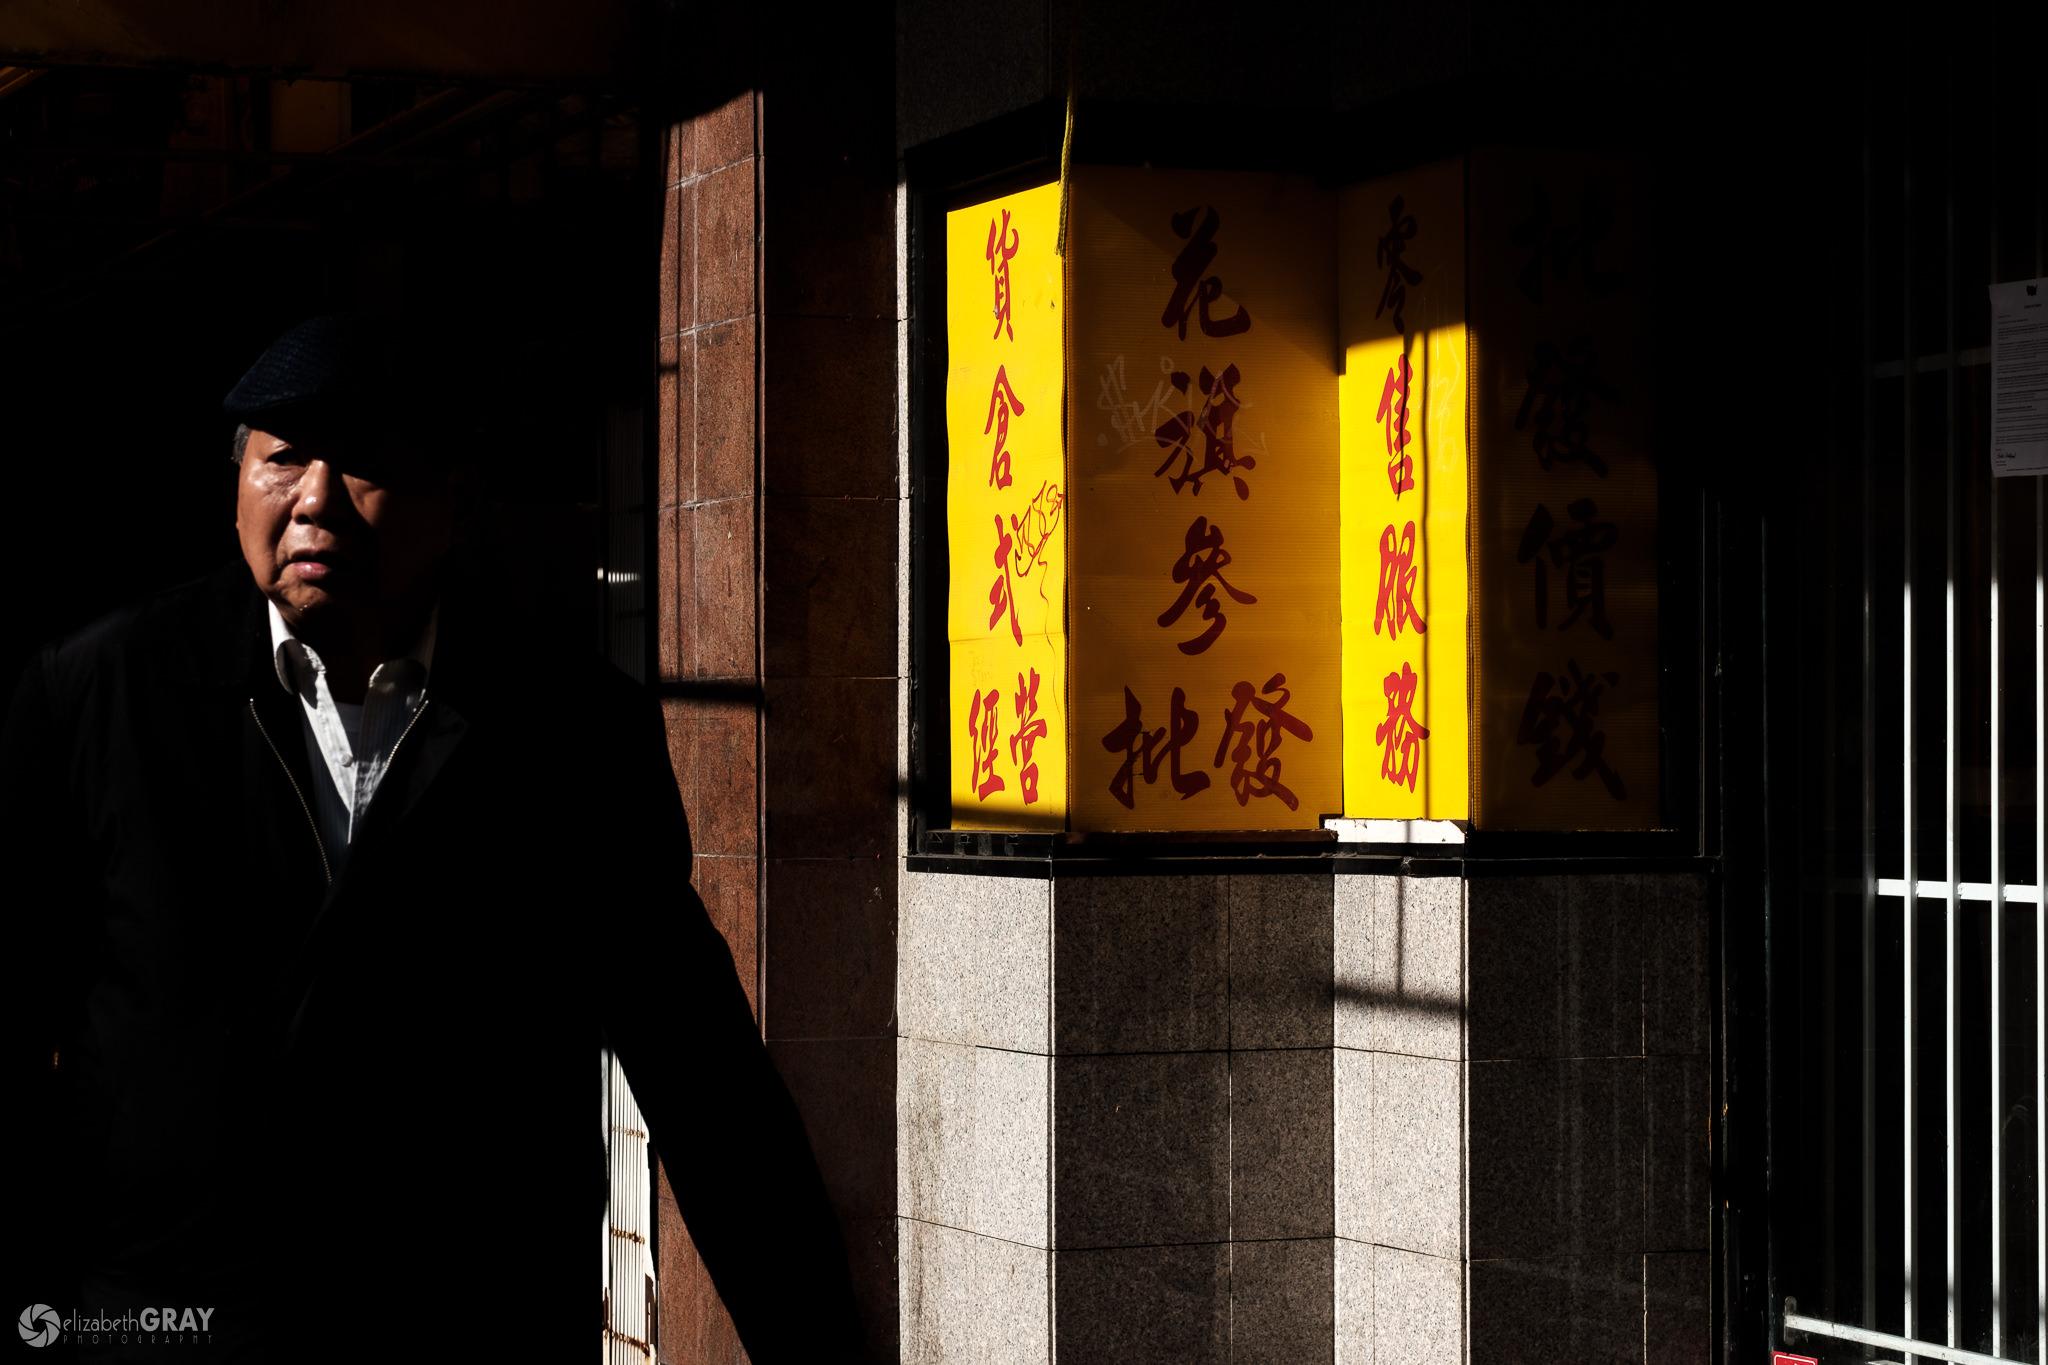 Chinatown Shopper